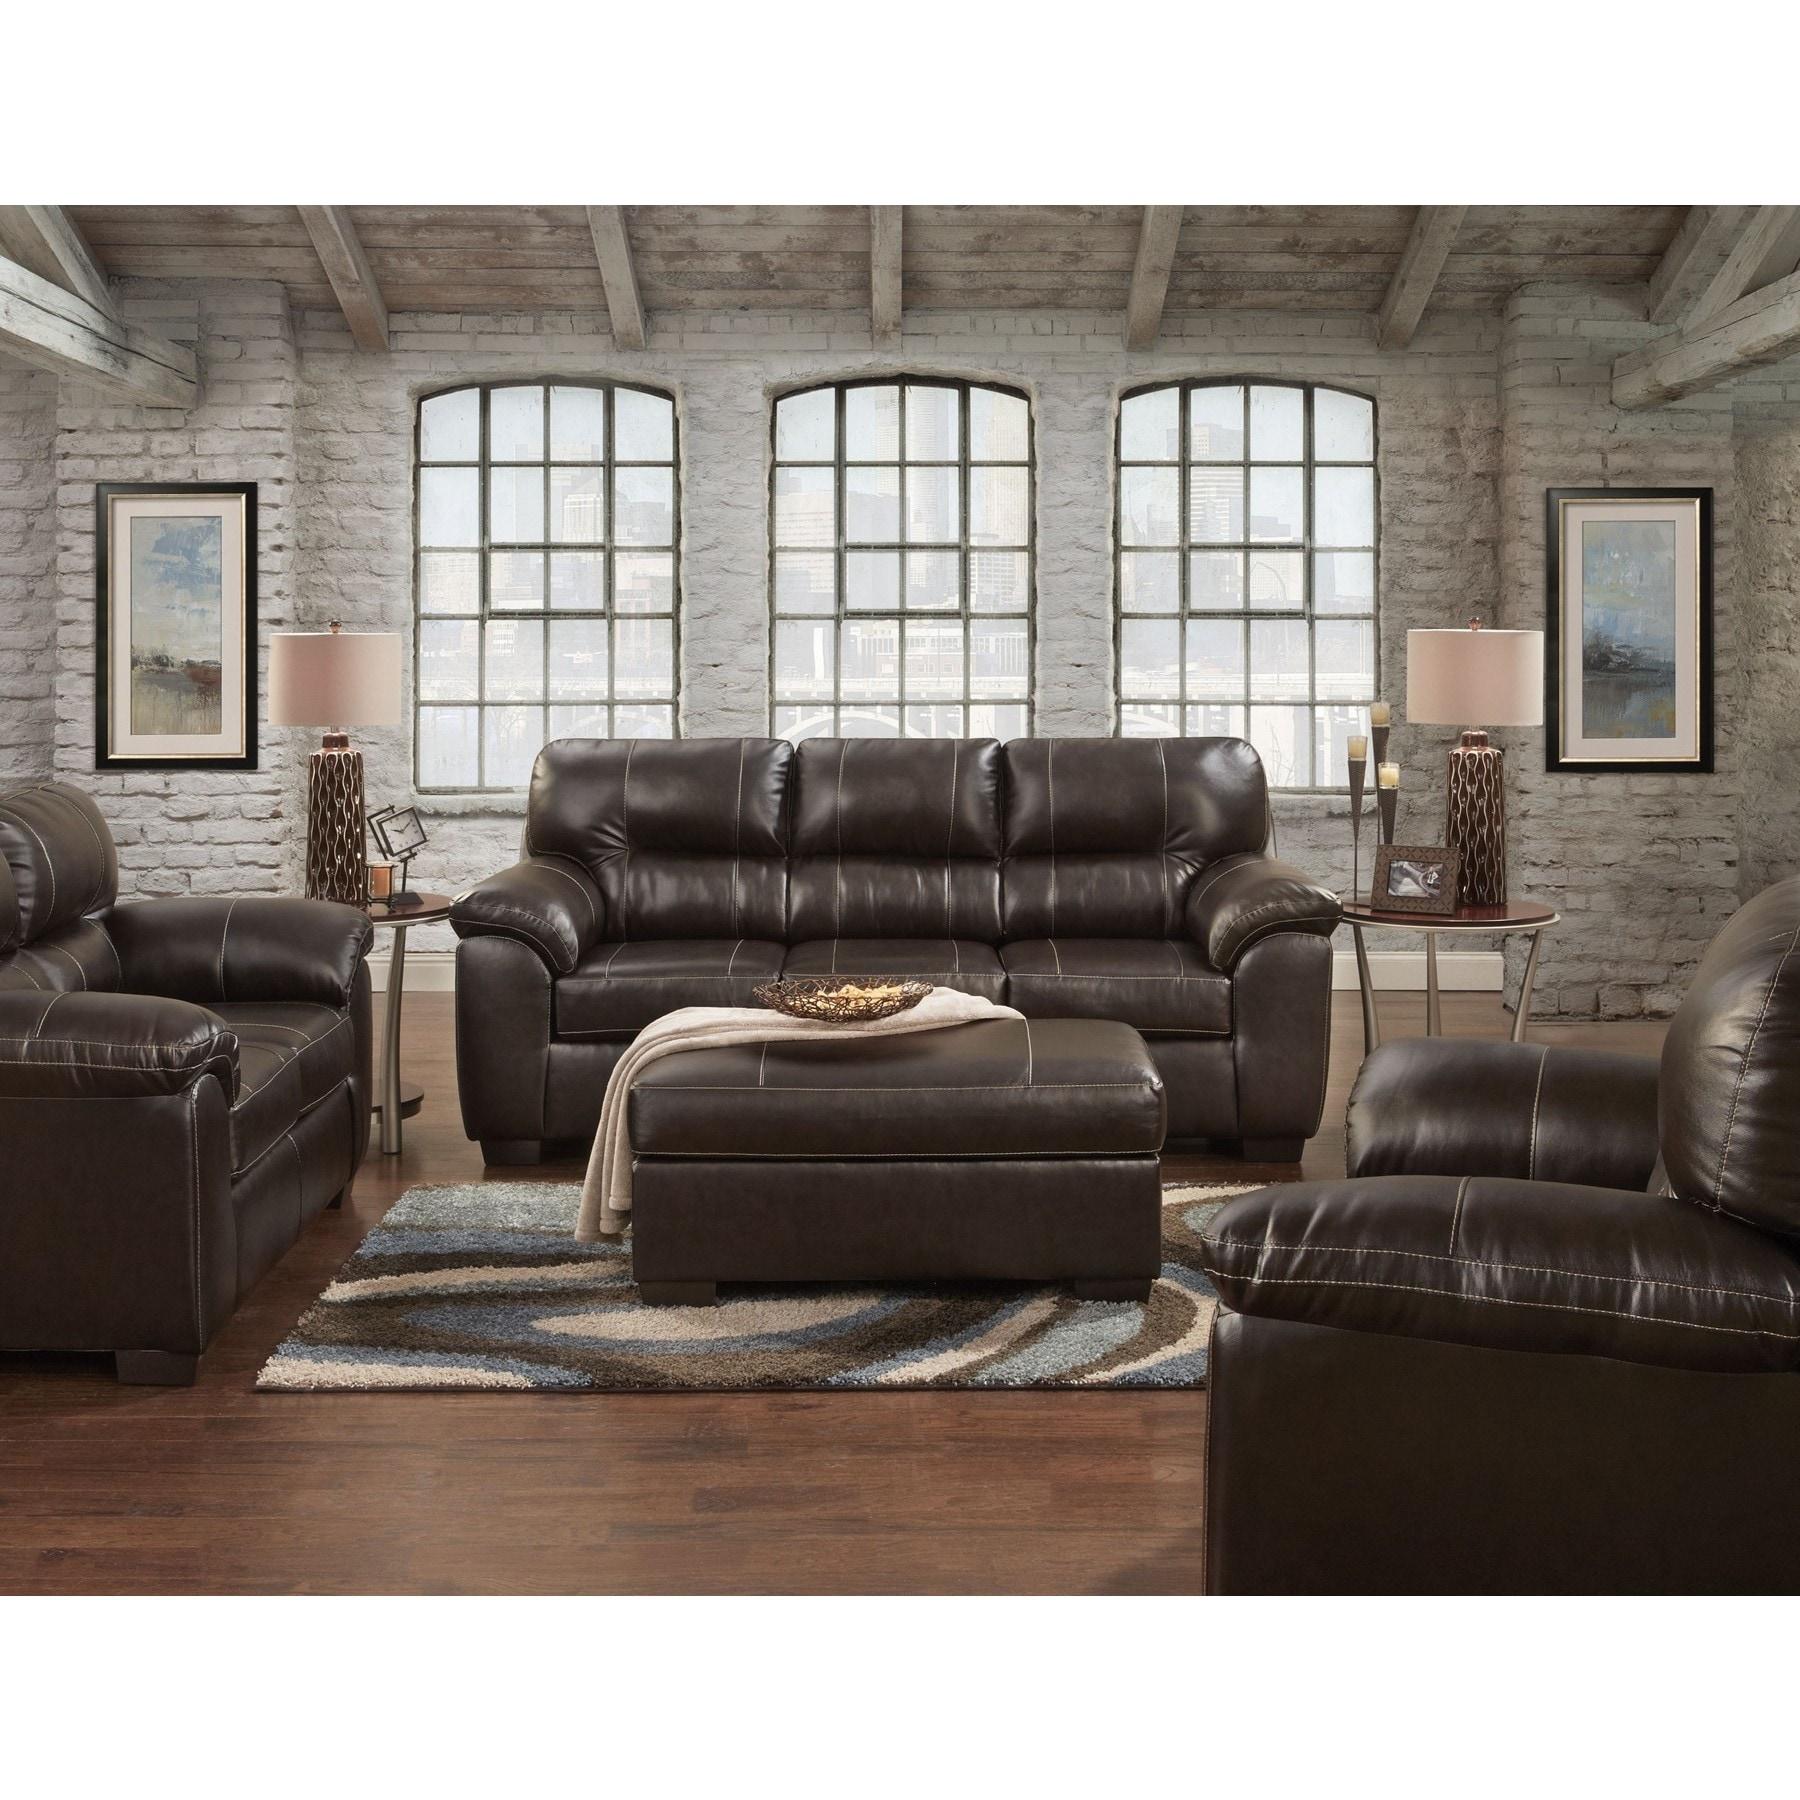 Sofa Trendz Corina Faux Leather Oversize Chair